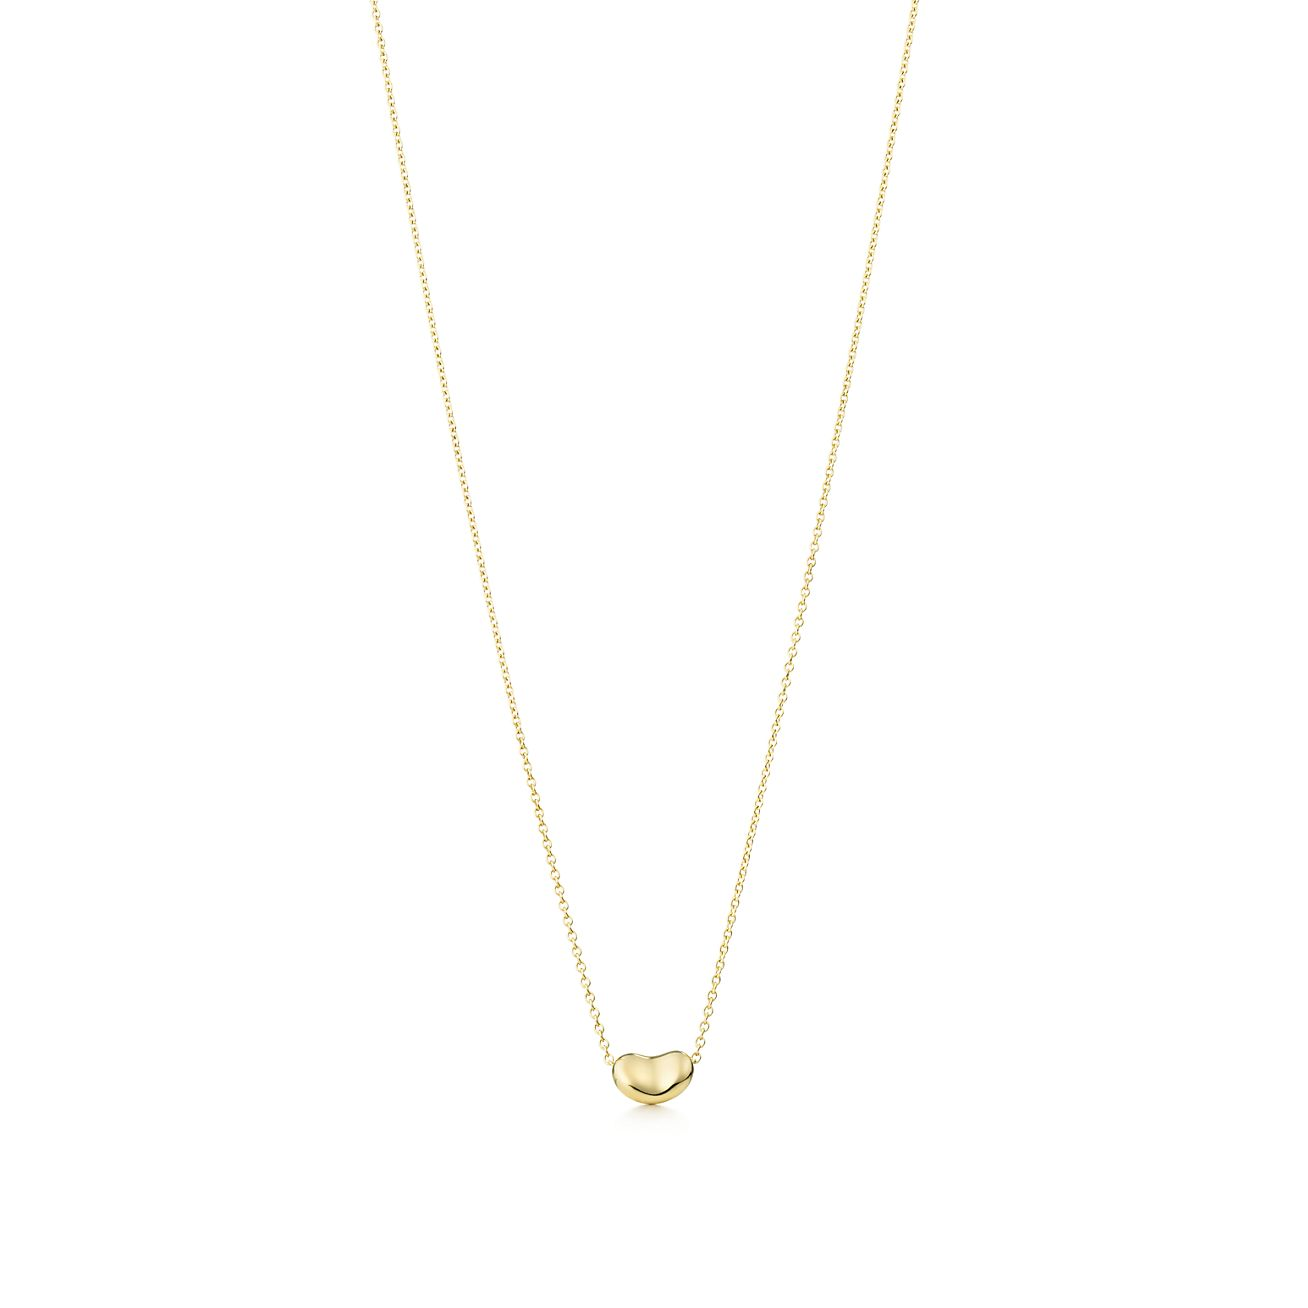 cd49bdd5c Elsa Peretti Bean Pendant In 18k Gold Tiffany Co. Elsa Peretti Bean Necklace  And Earrings